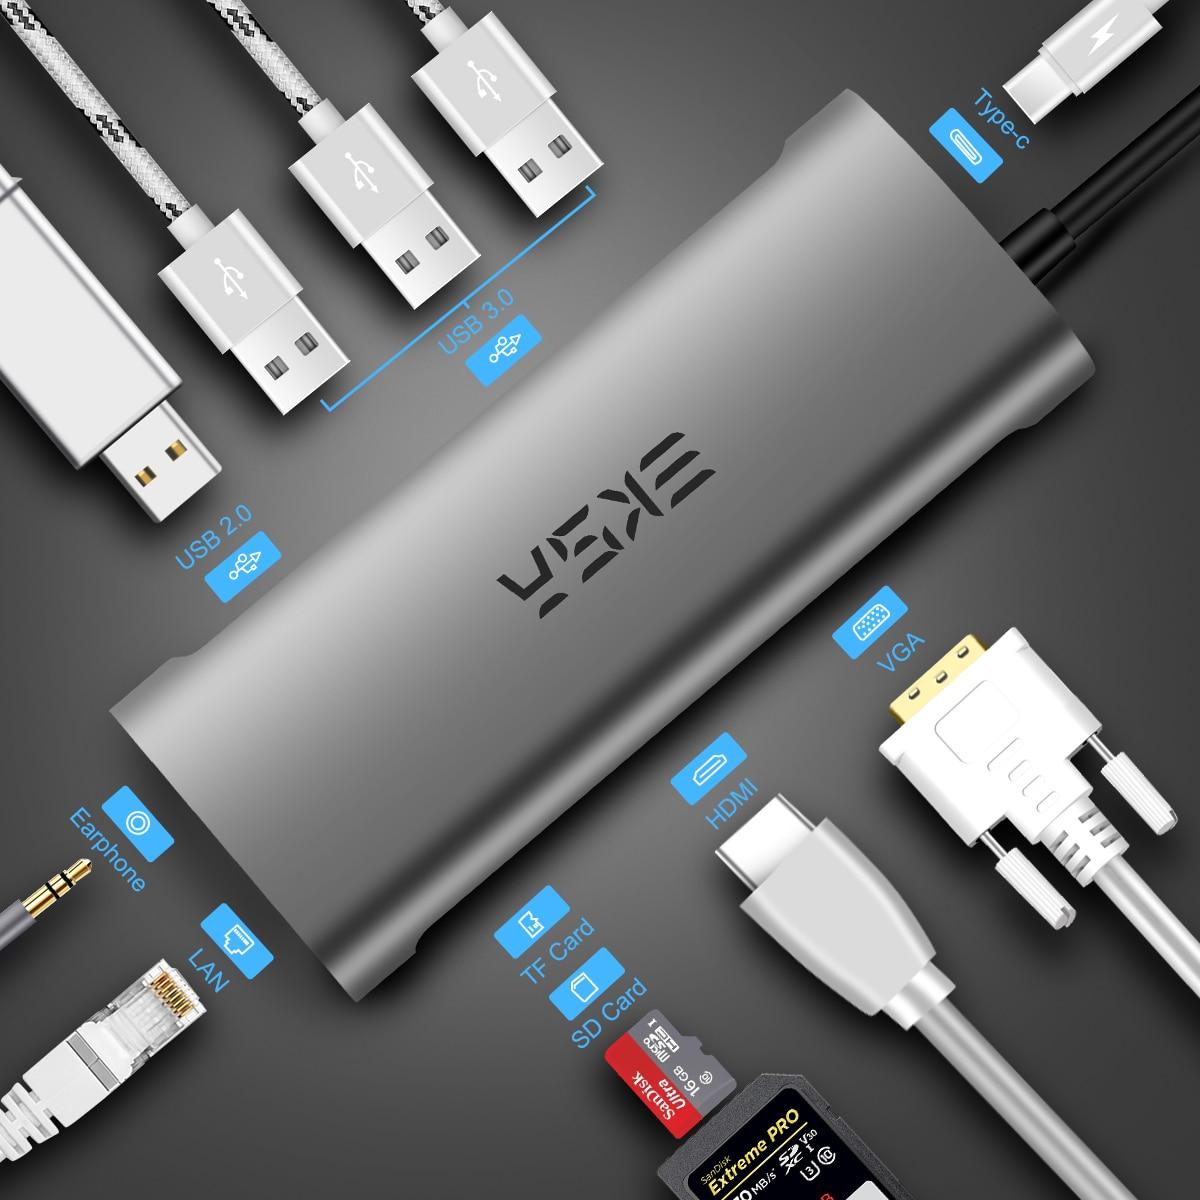 EKSA USB HUB C HUB To USB 3.0 2.0 RJ45 VGA HDMI Adapter Dock For MacBook Pro Huawei Samsung USB-C Type C 3.0 Splitter USB C HUB